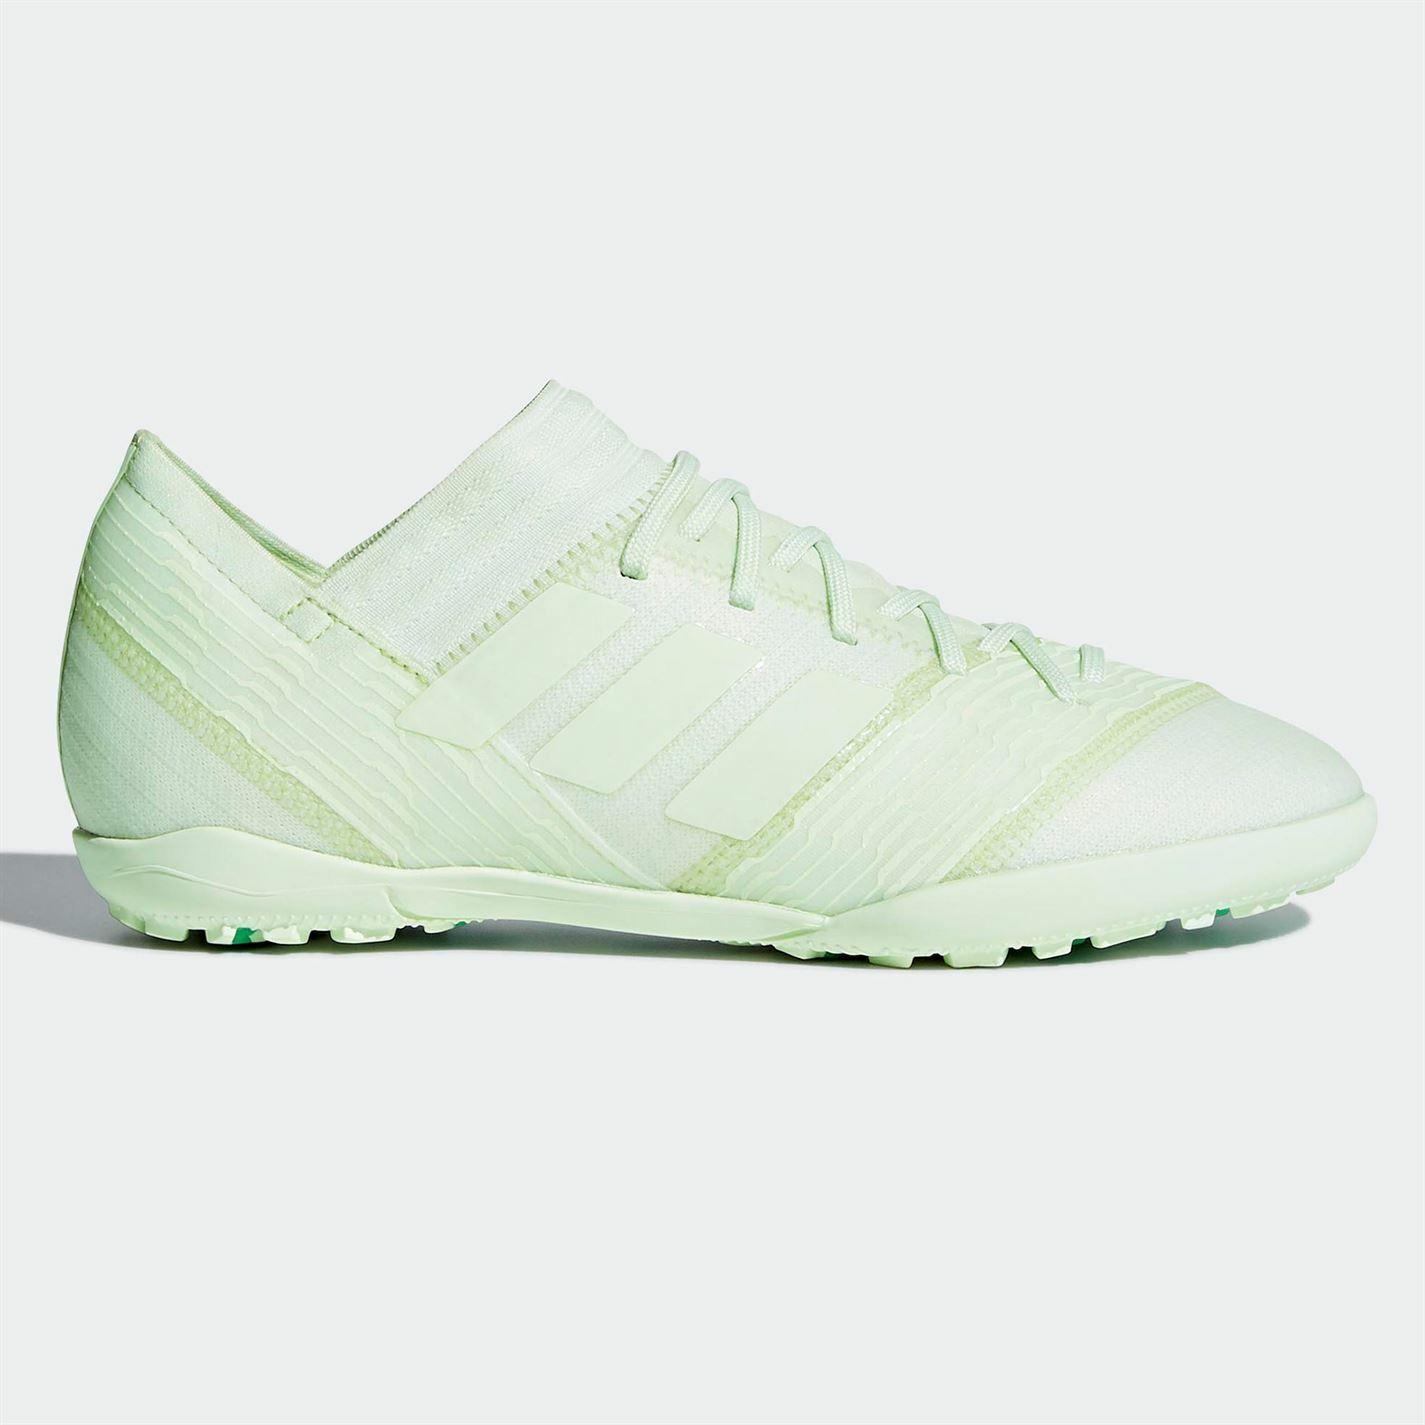 Adidas Nemeziz Tango 17.3 Astro Calcio Allenatori Bambini verde Scarpe Calcio